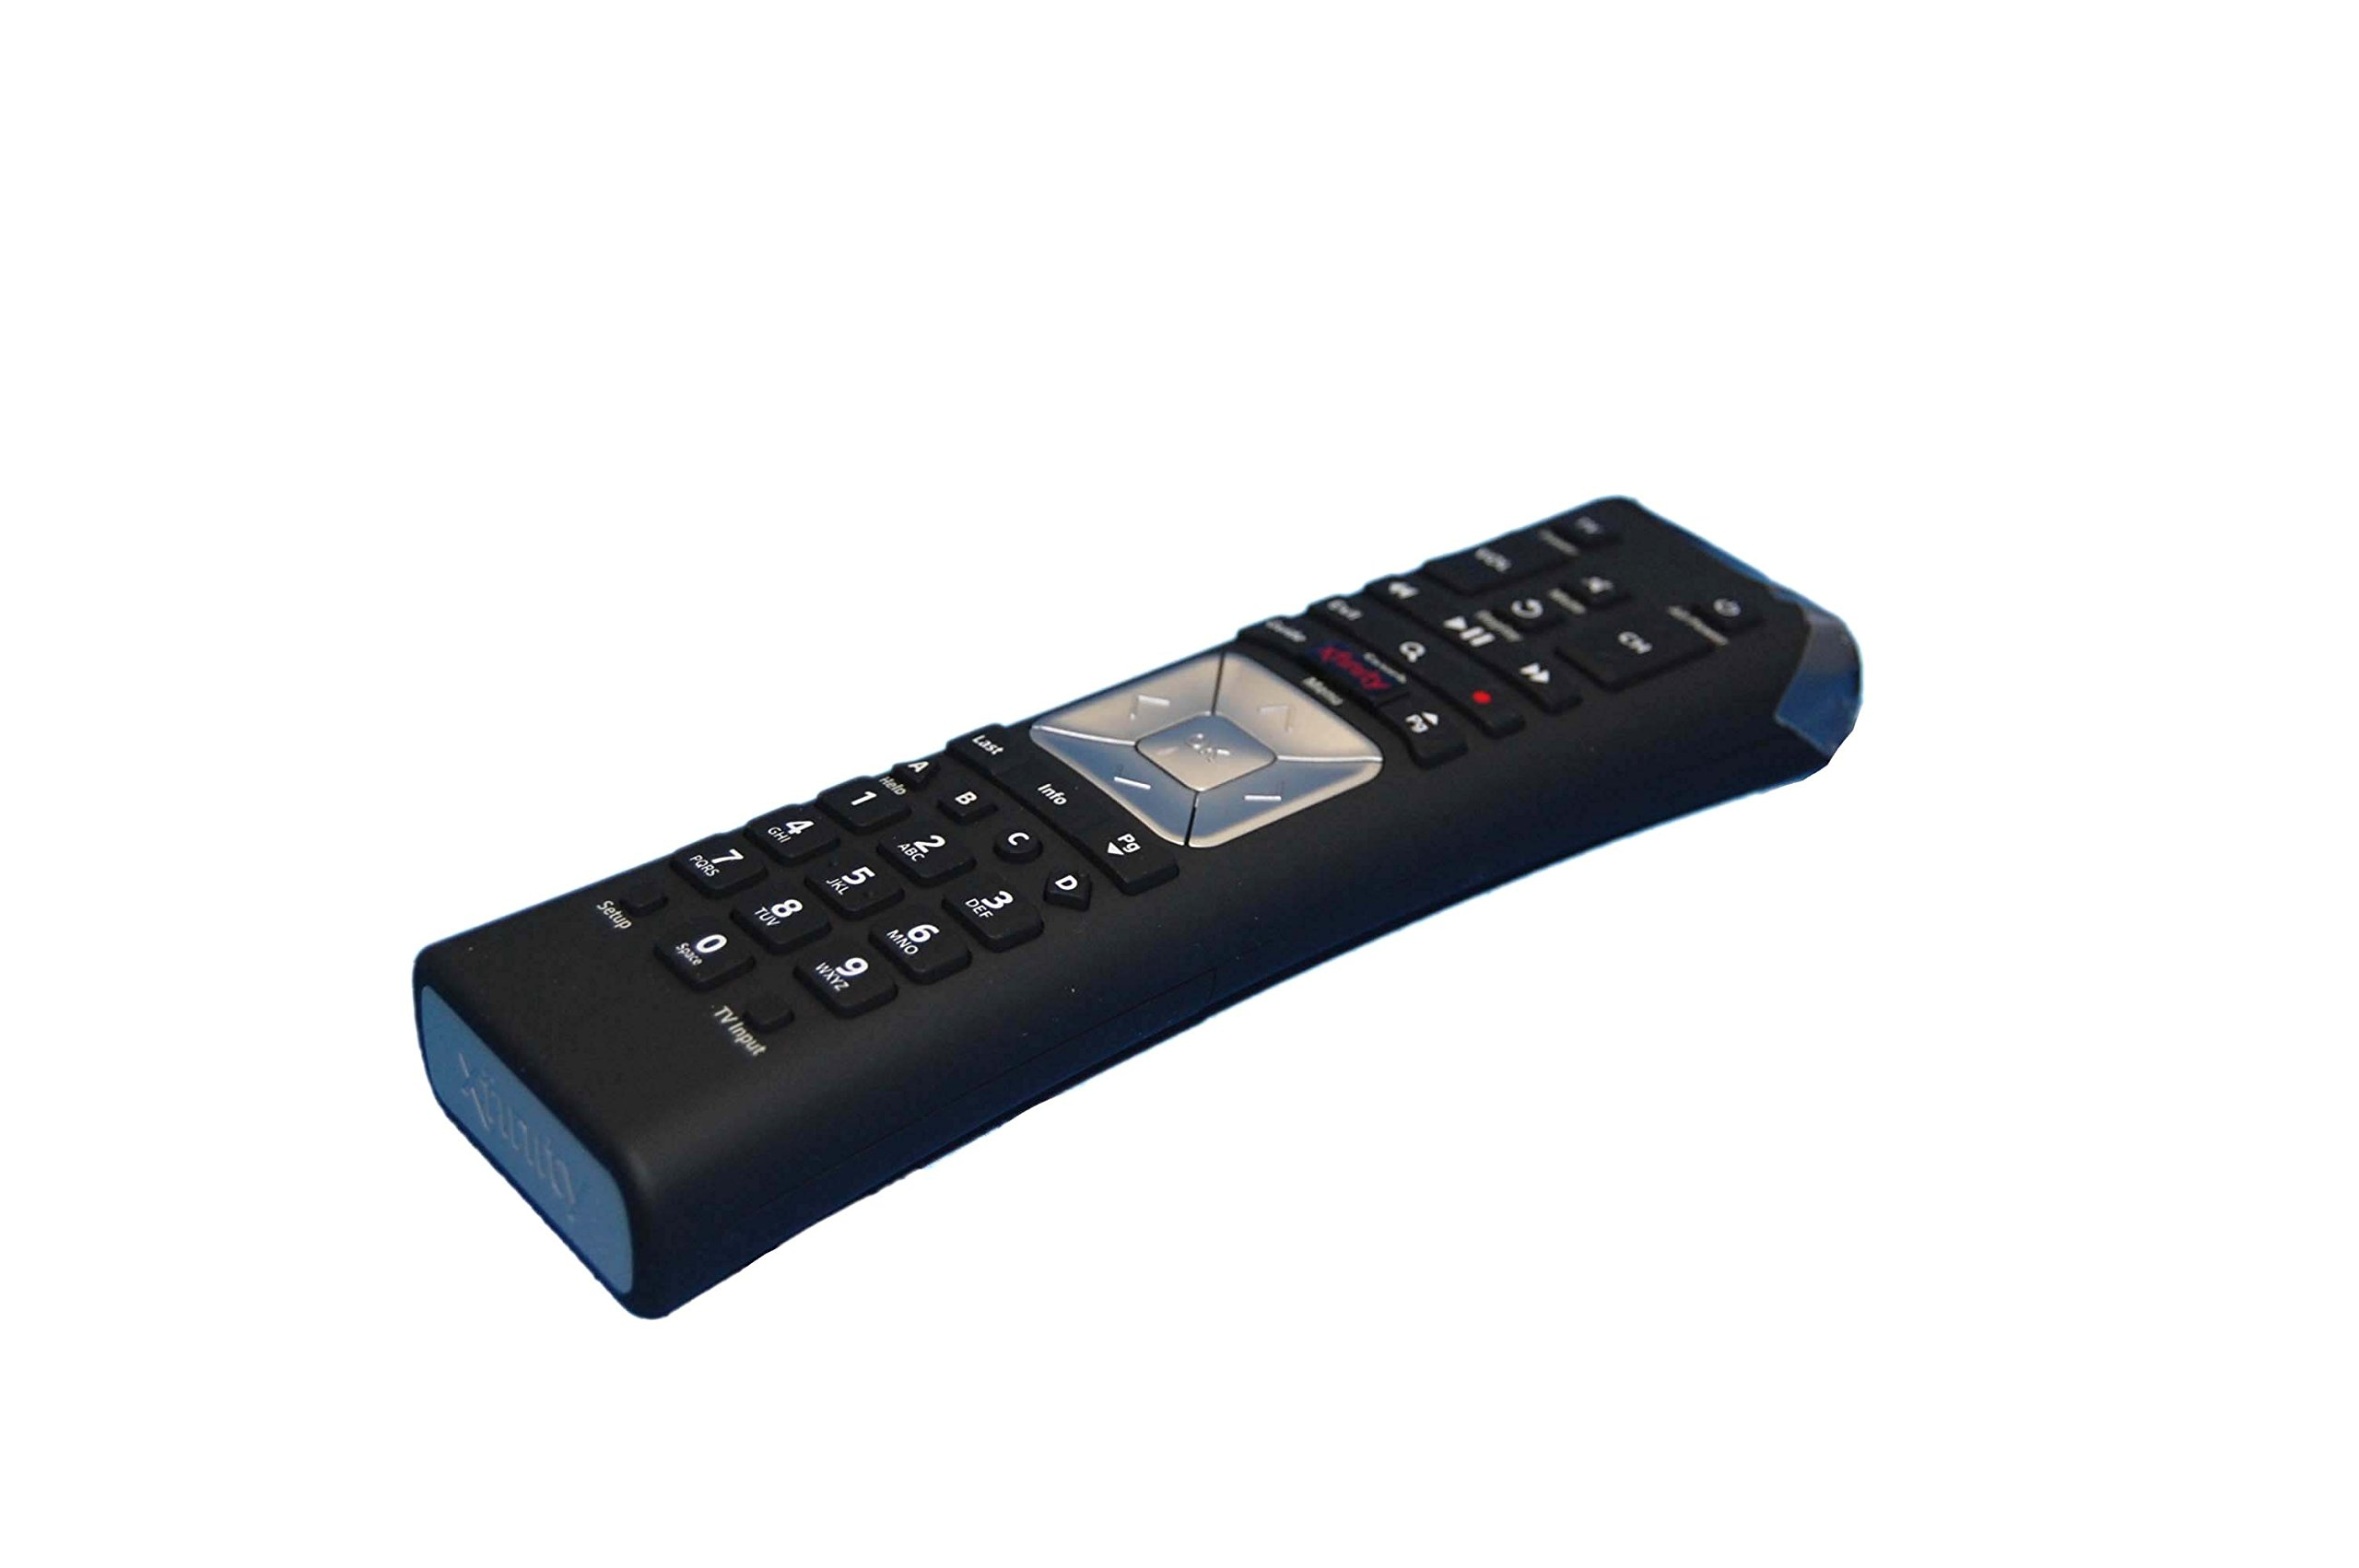 Control Remoto Xfinity Comcast XR5 RF X1 w/ BackLight  Ve...